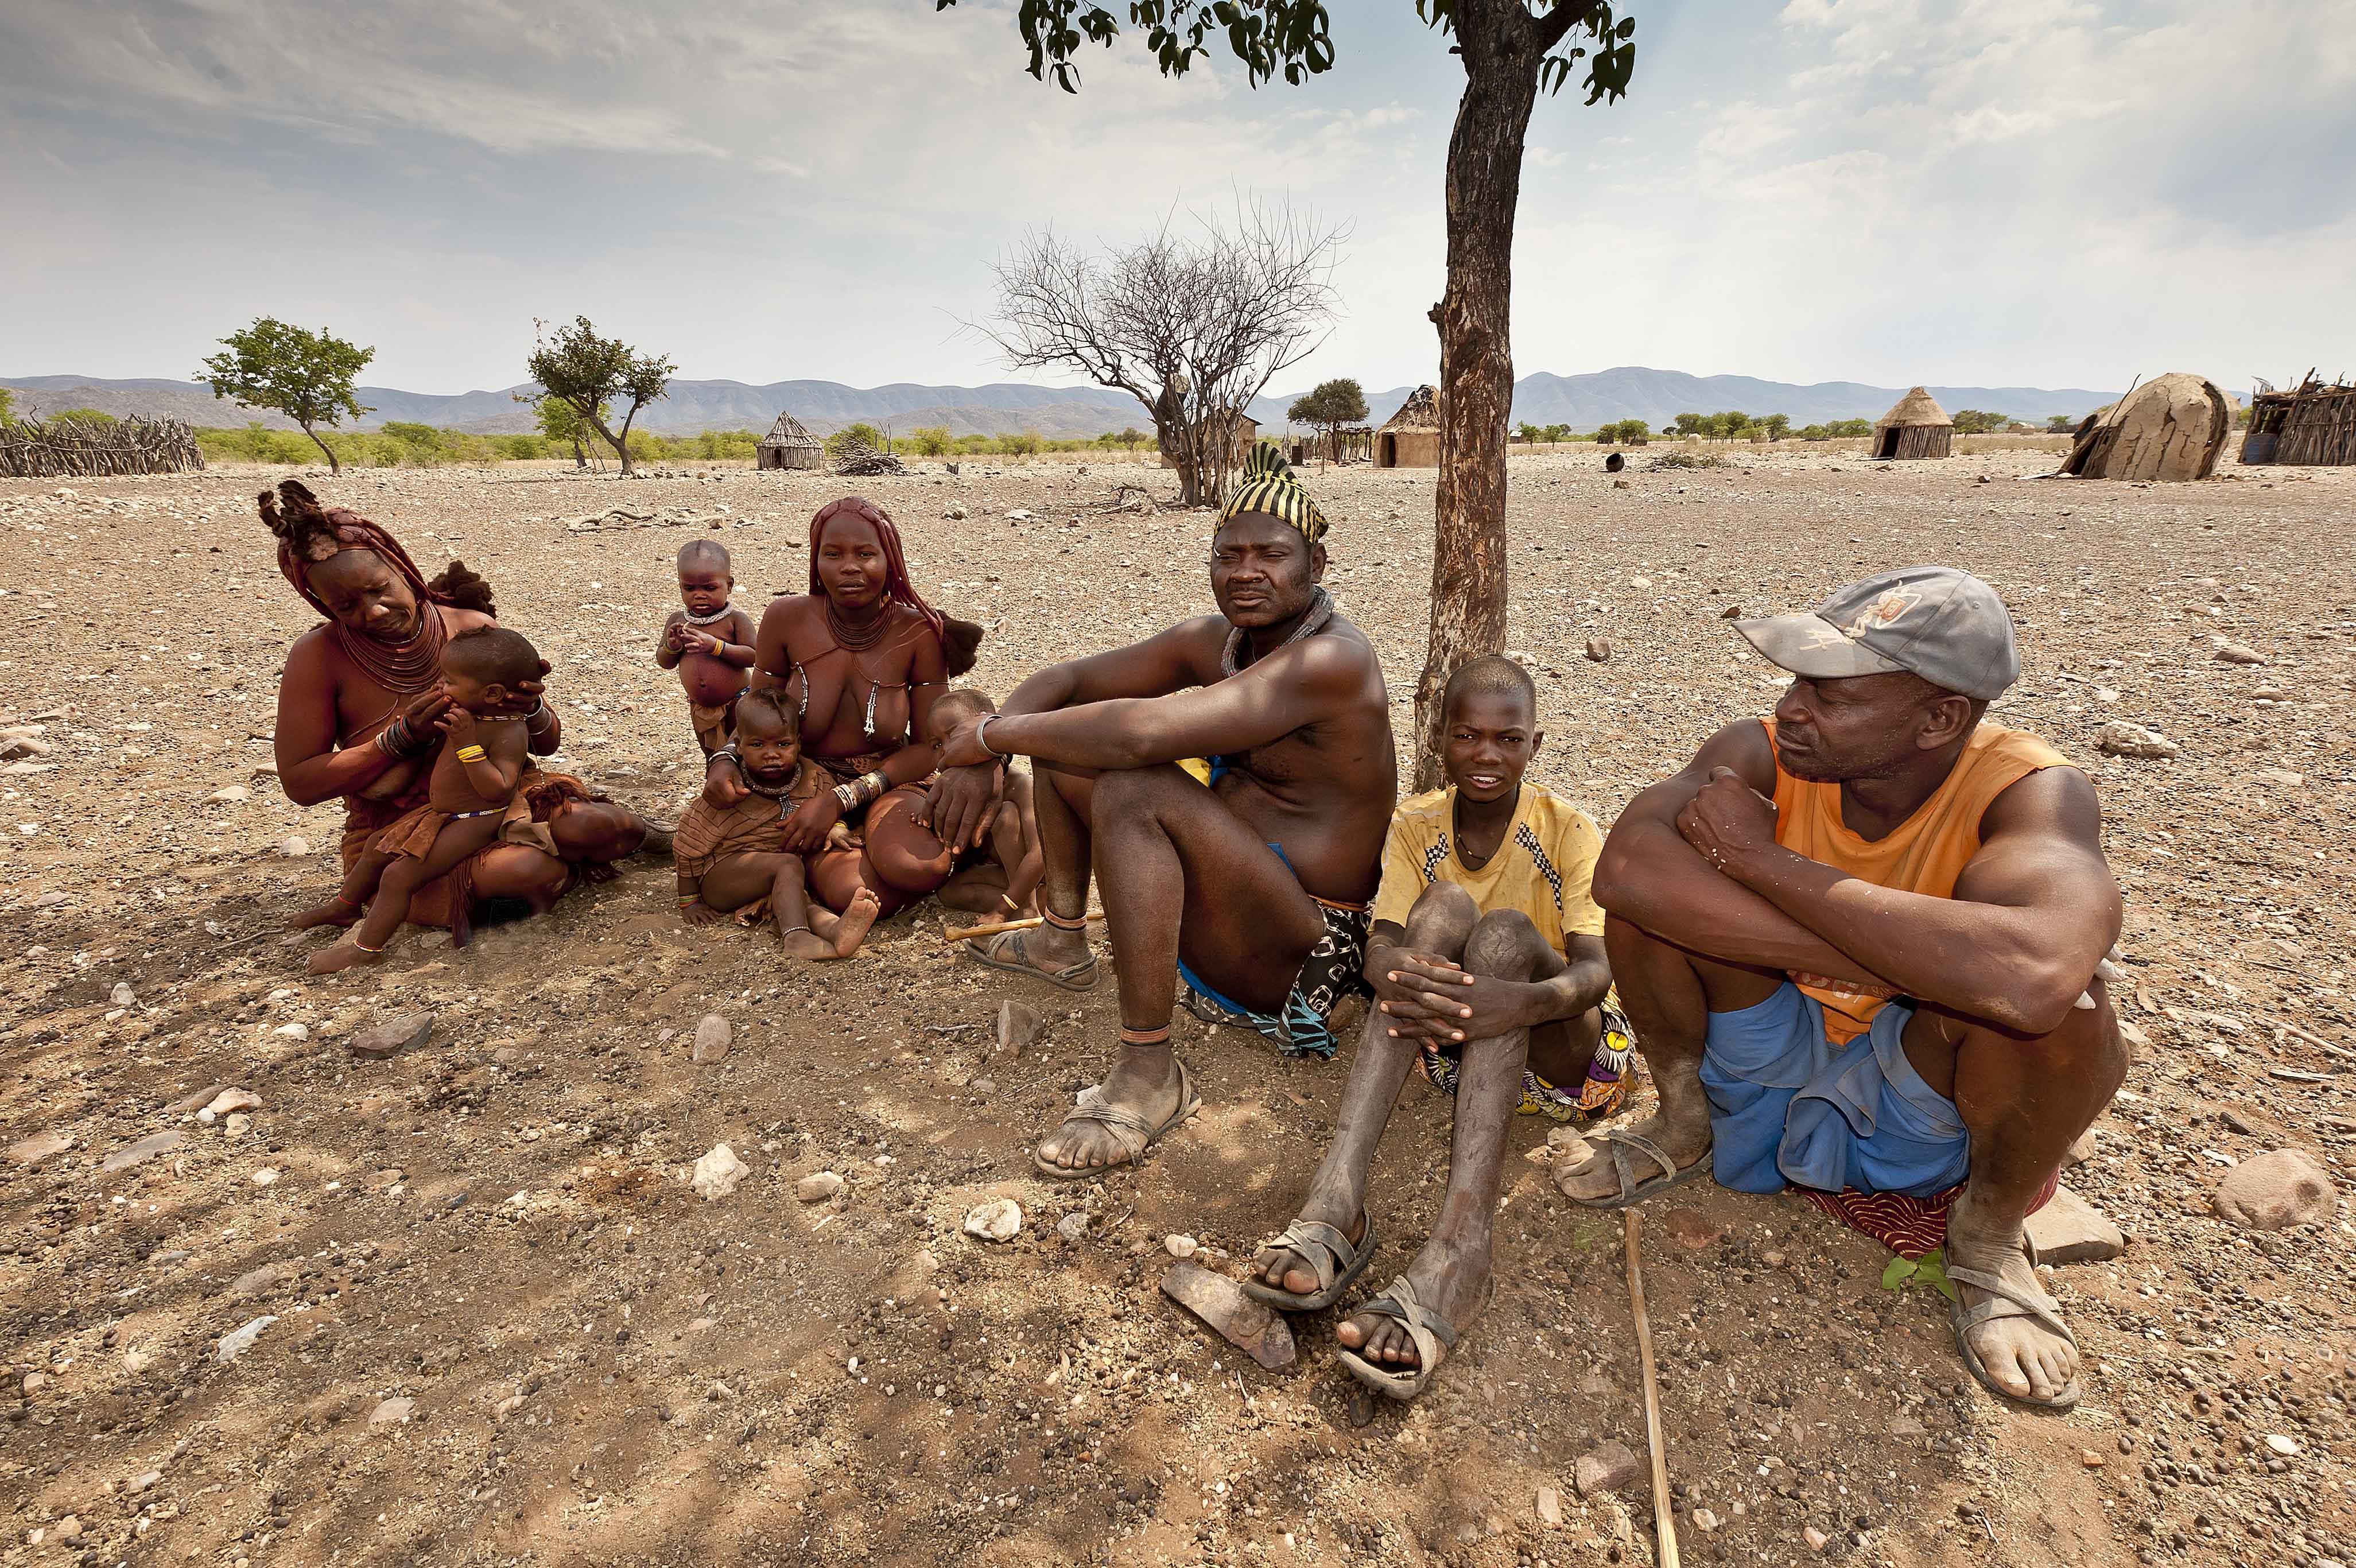 people of namibia bengt bjurstr m photography